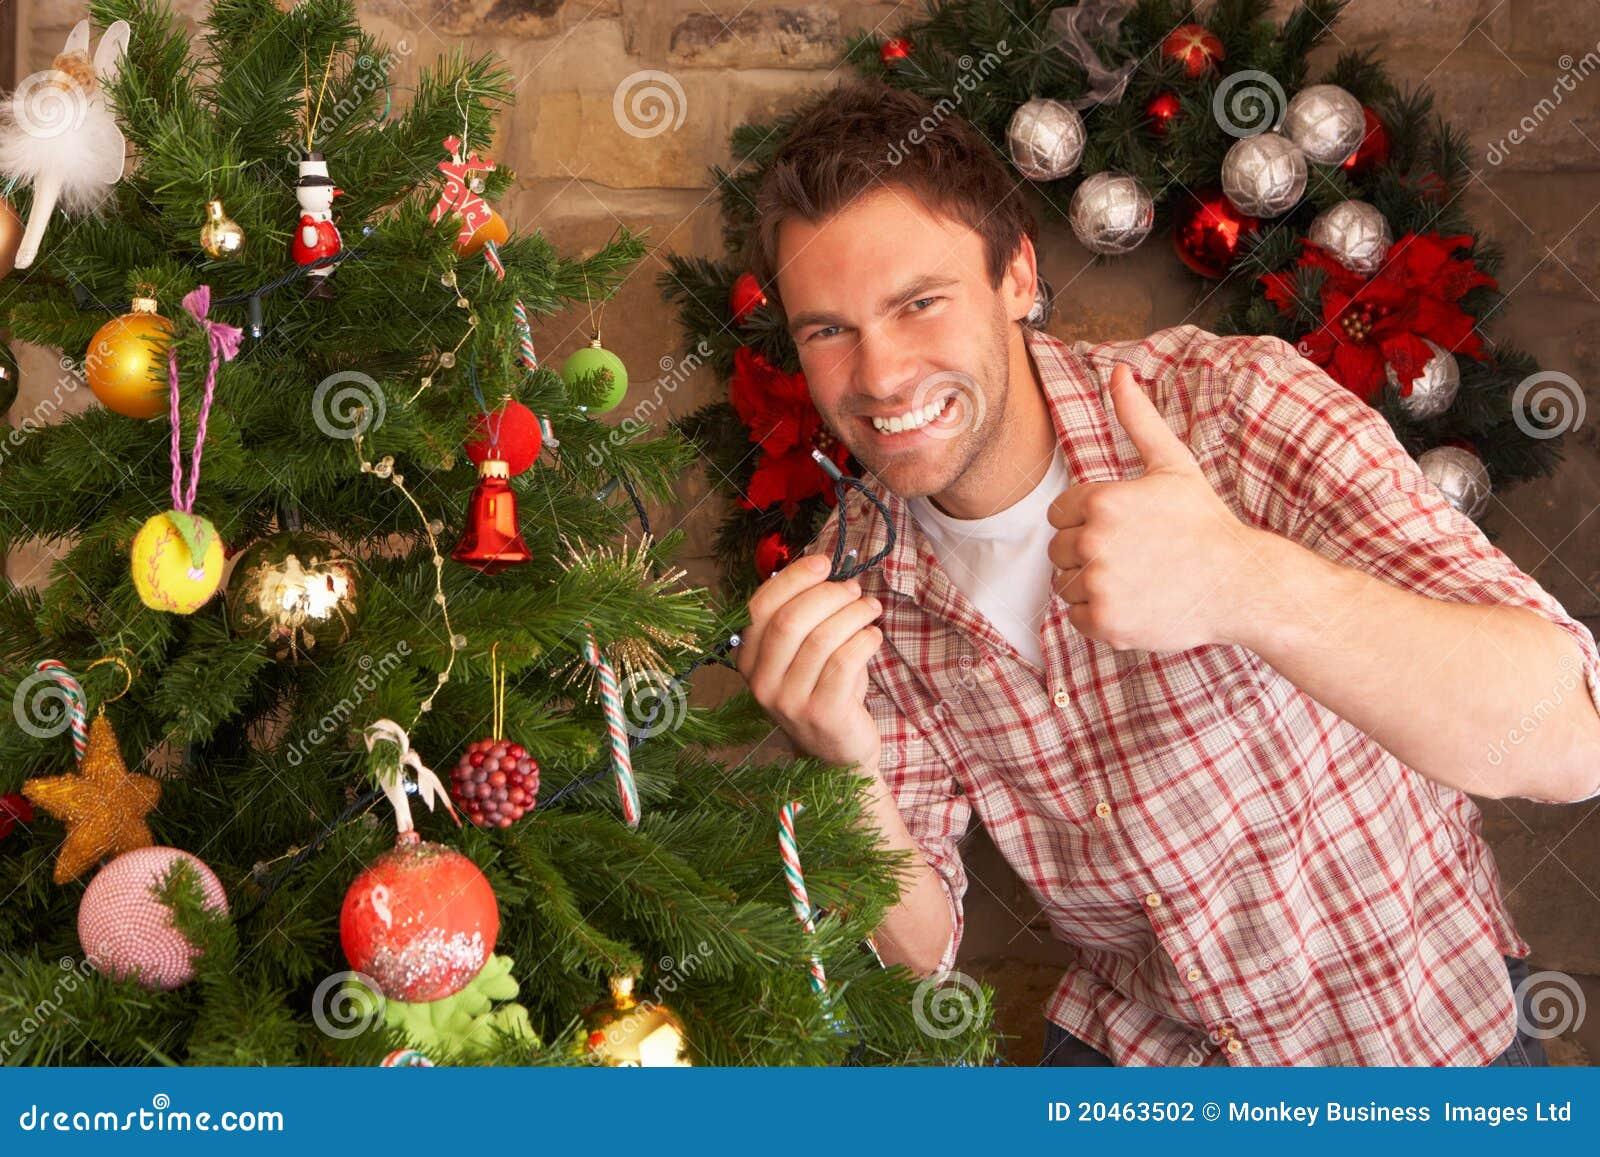 Fix Broken Christmas Lights